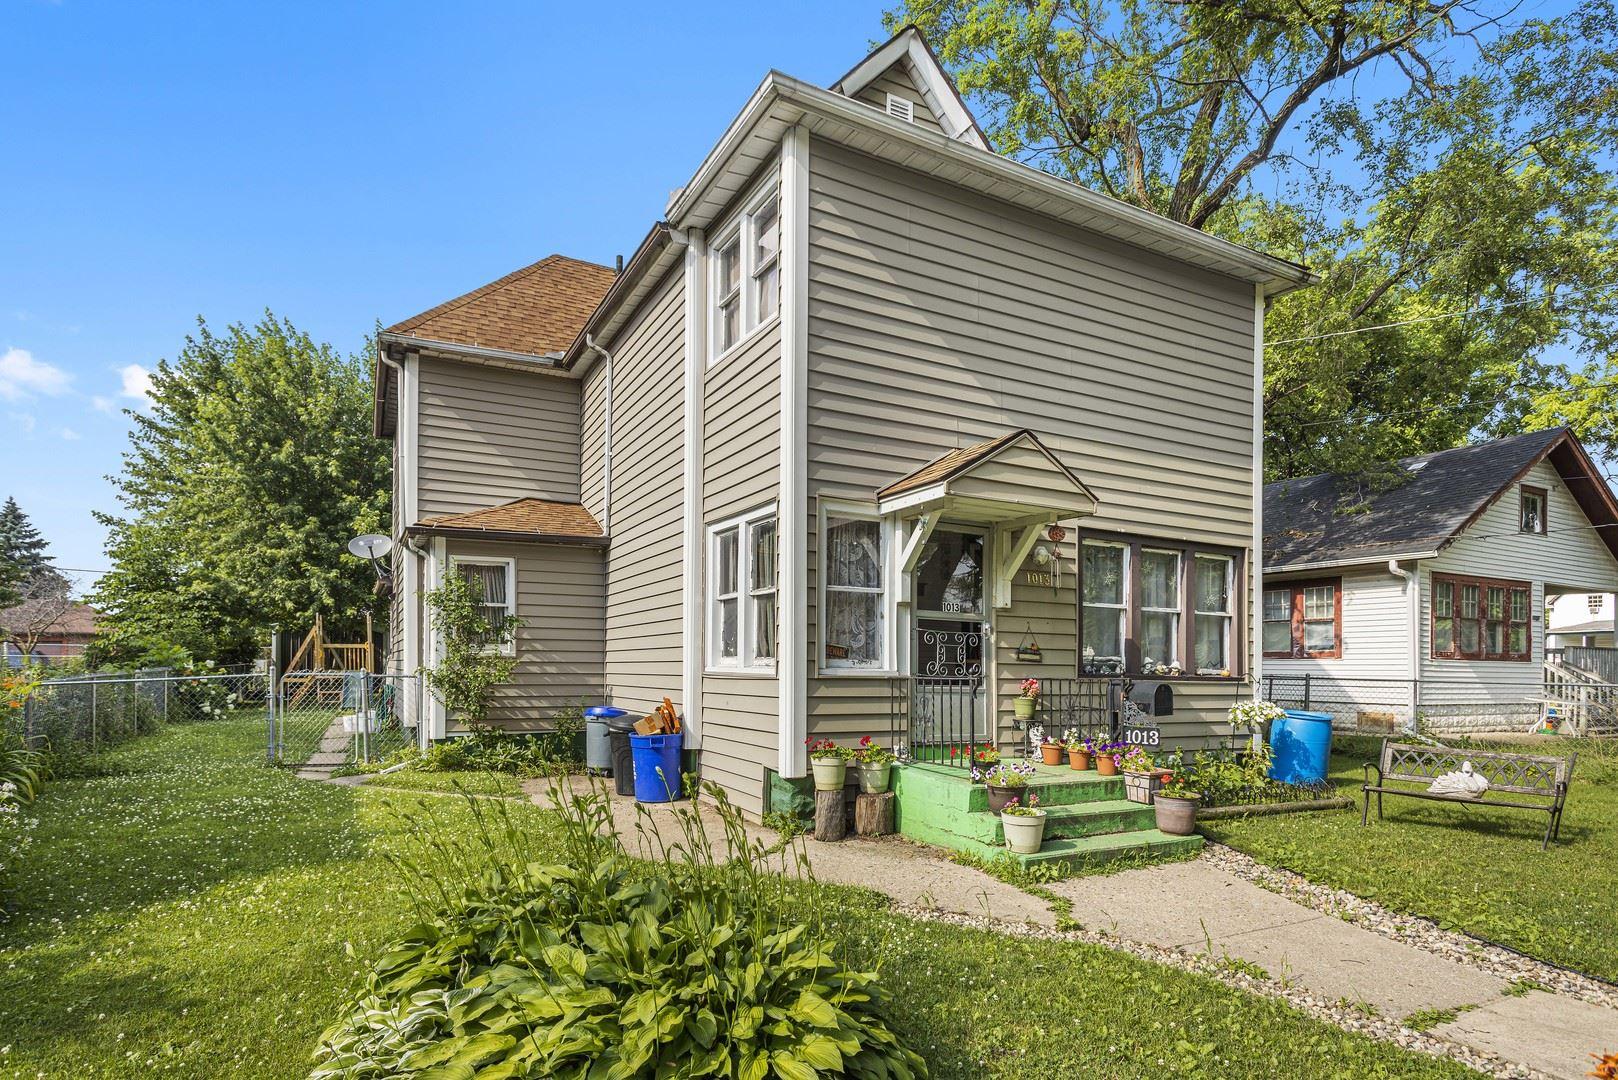 1013 Loomis Street, Rockford, IL 61102 - #: 10767756